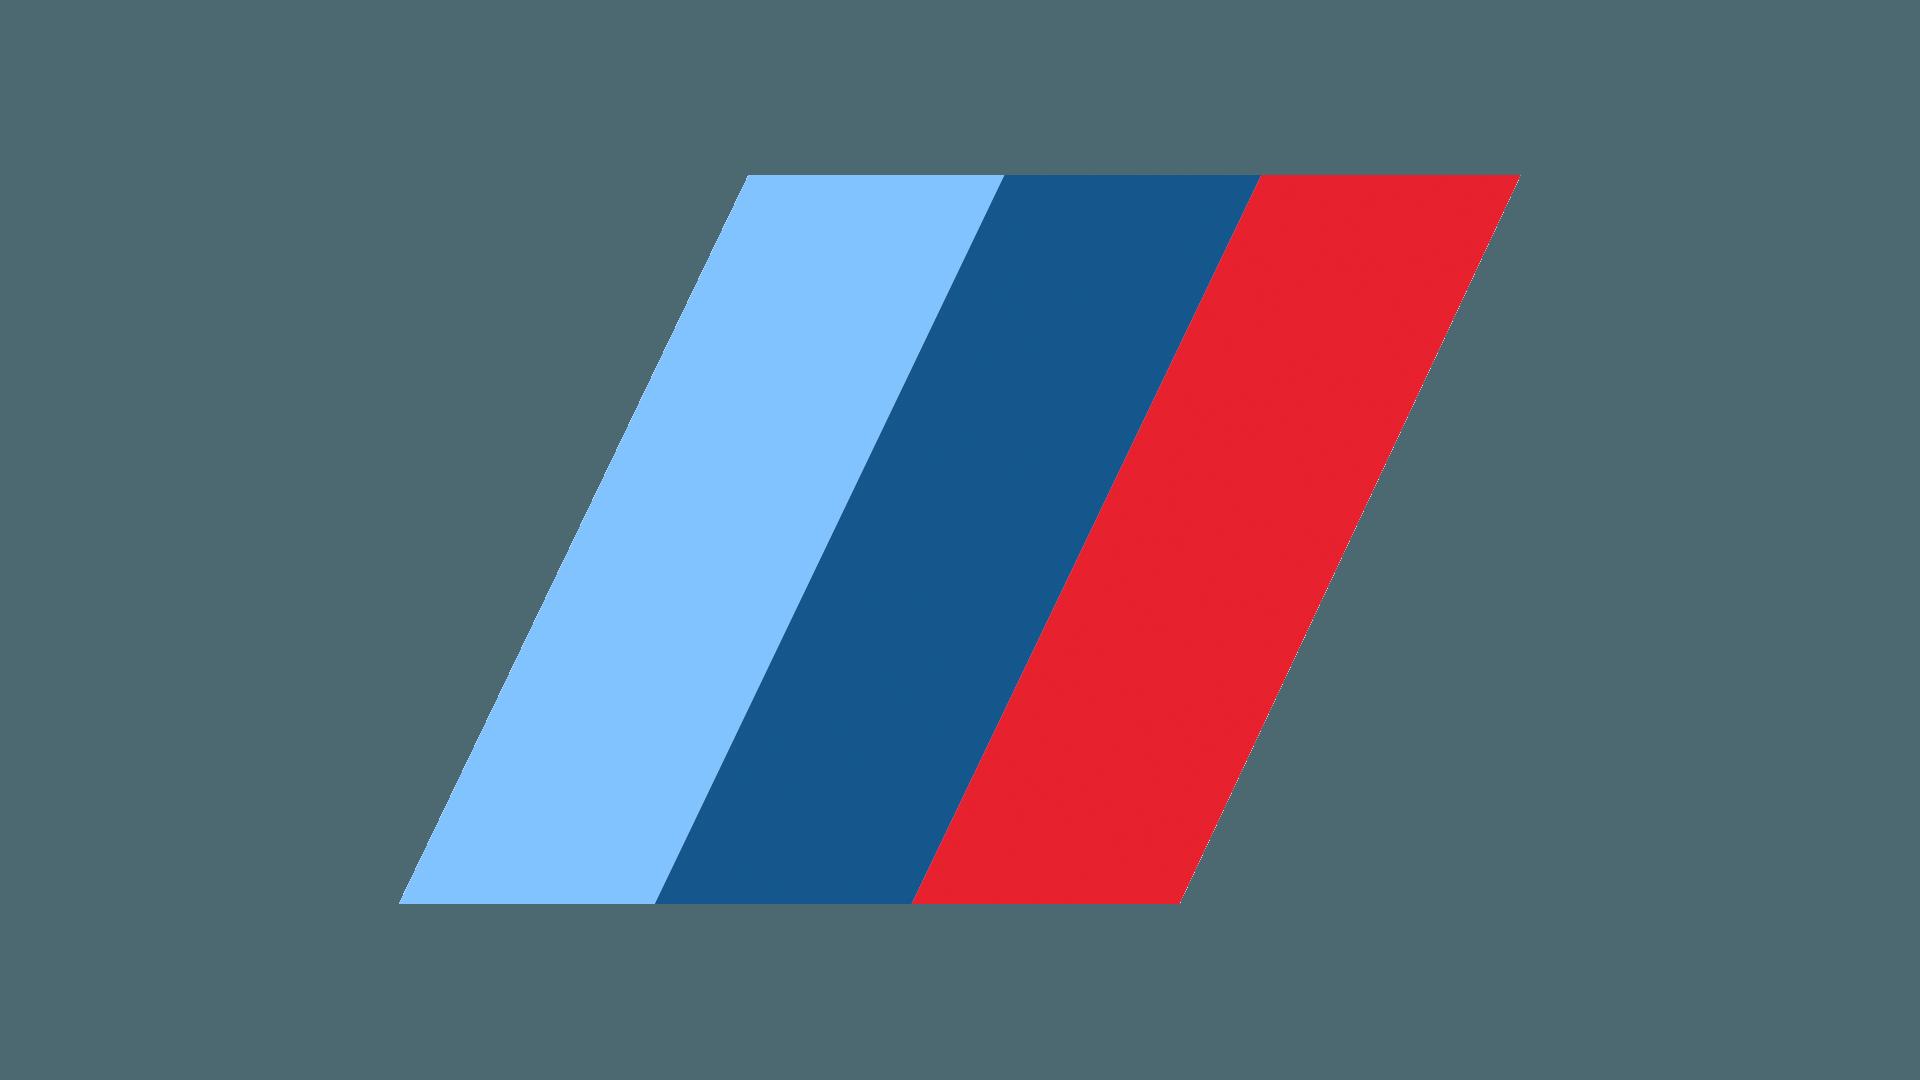 bmw m logo 6700